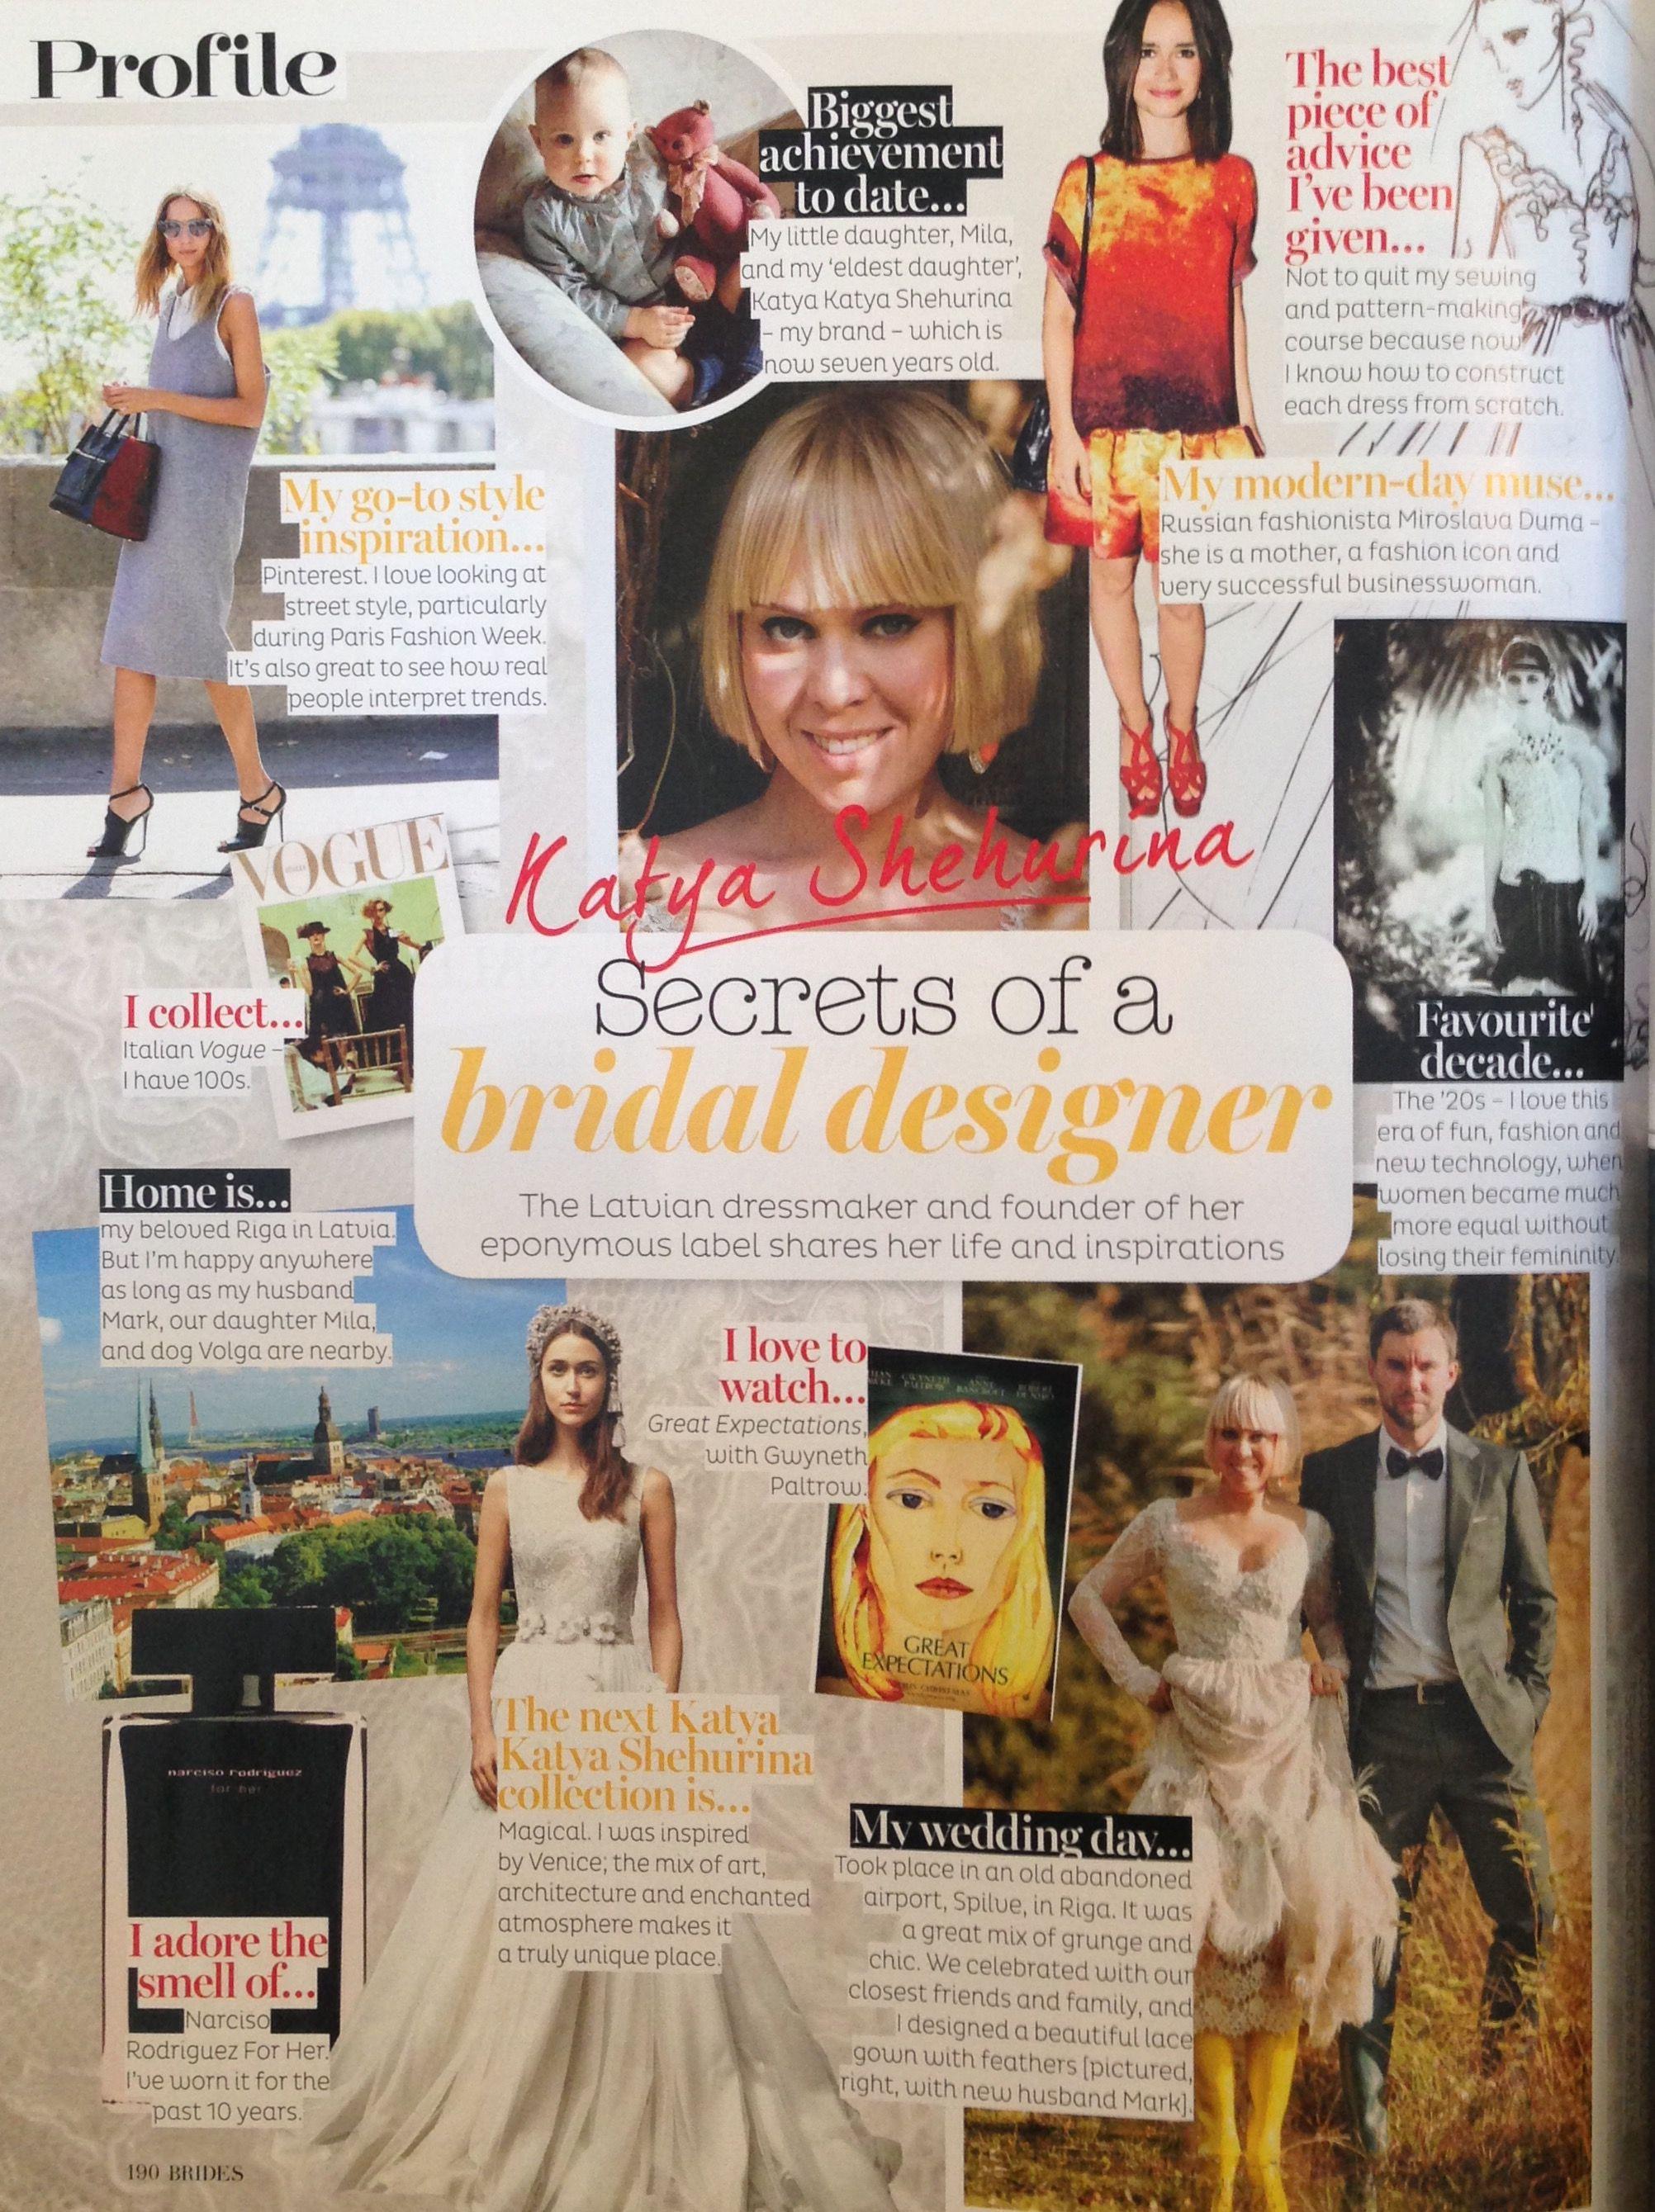 Designer profile of katya sehurina in brides magazine vintage